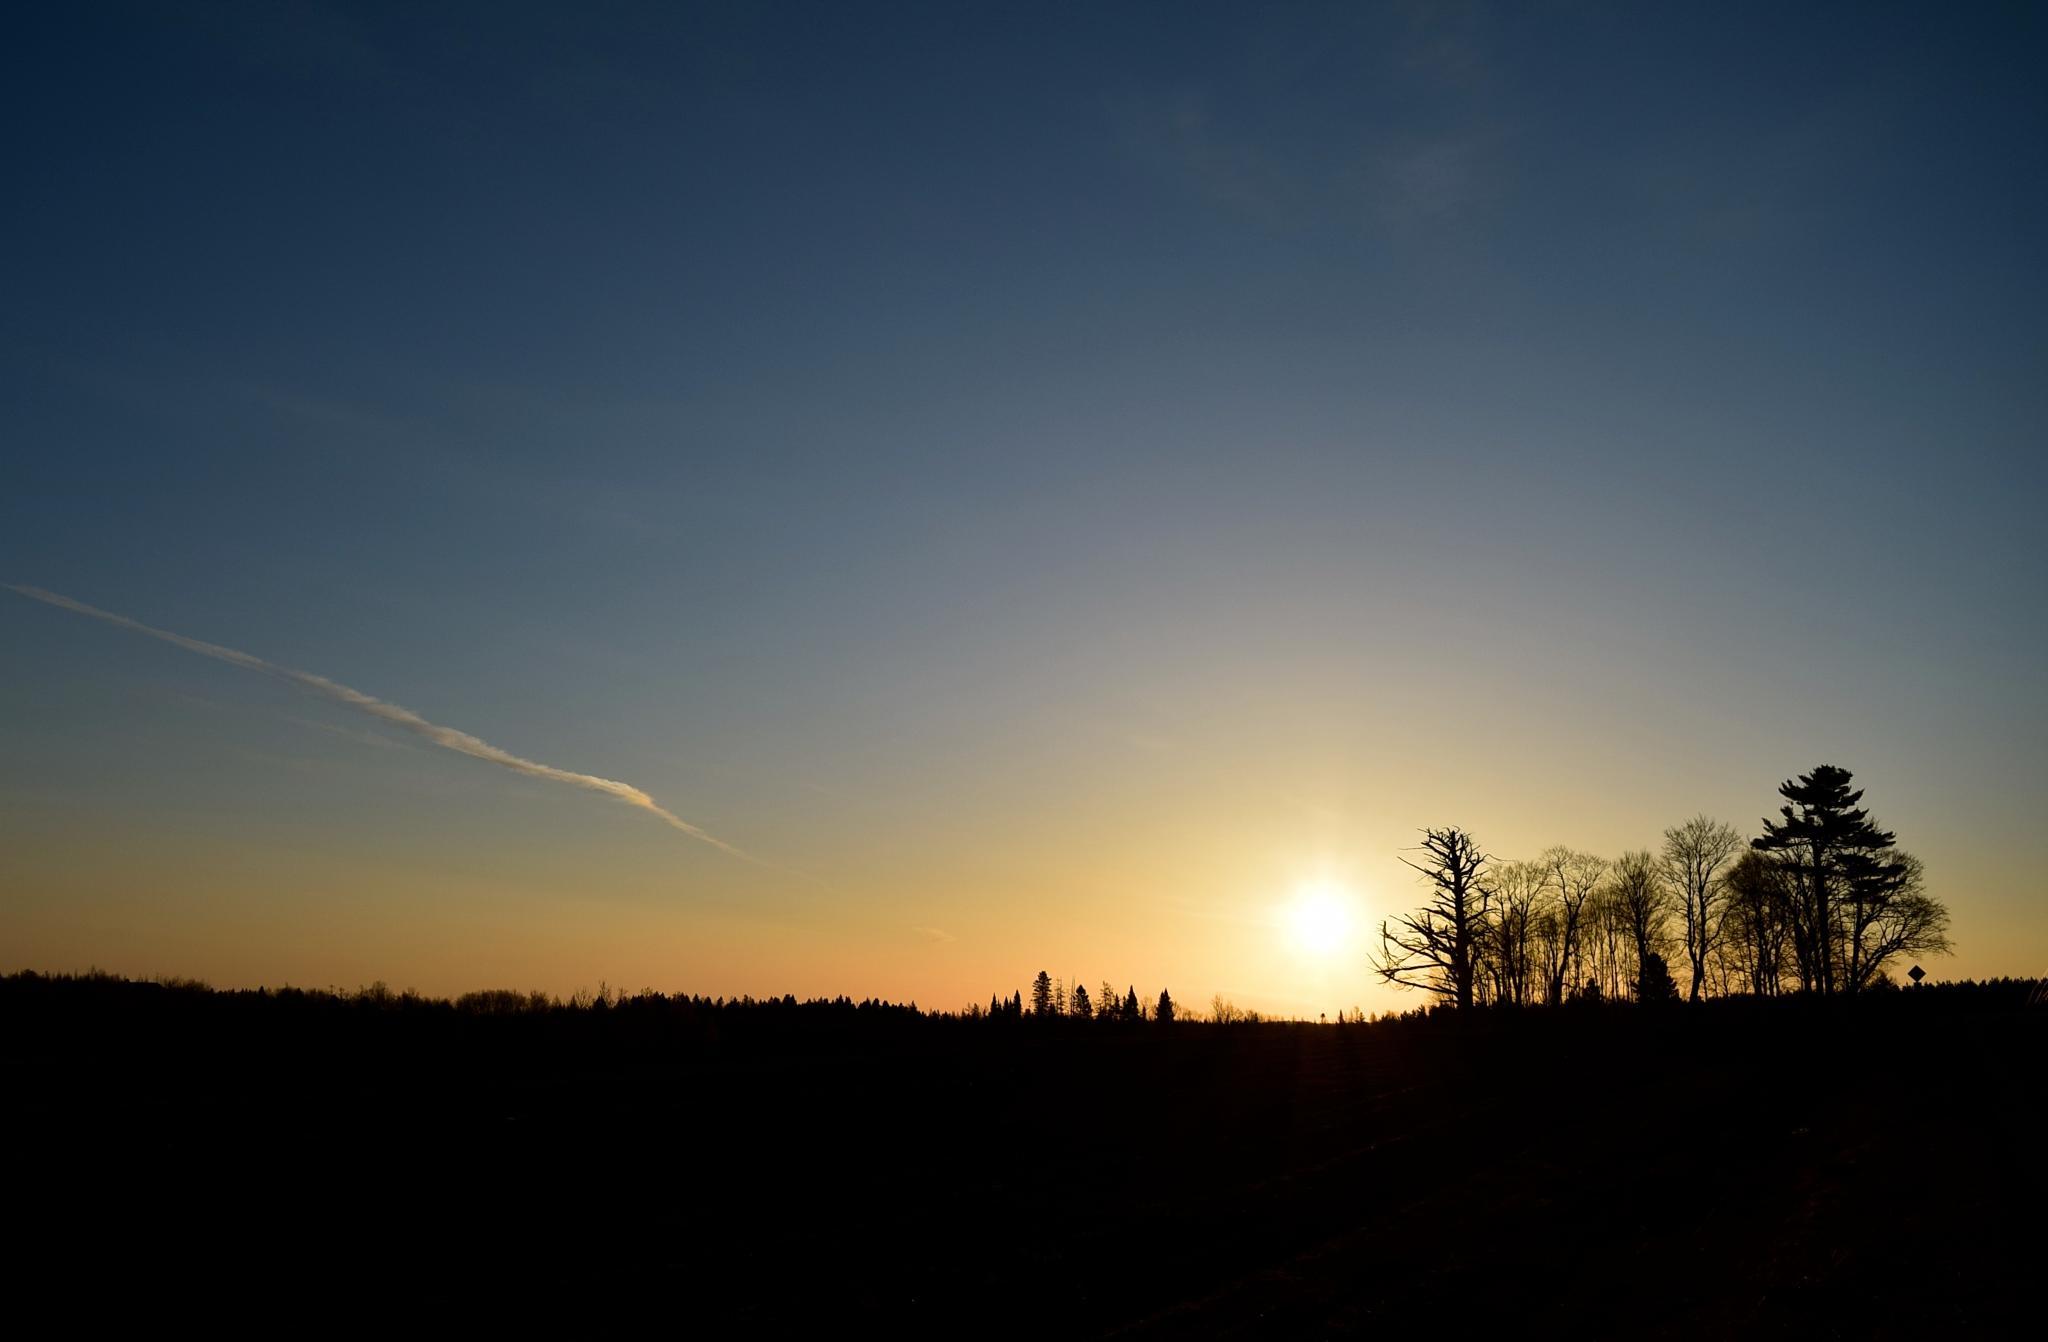 SunRise Glow by vonda.lavway